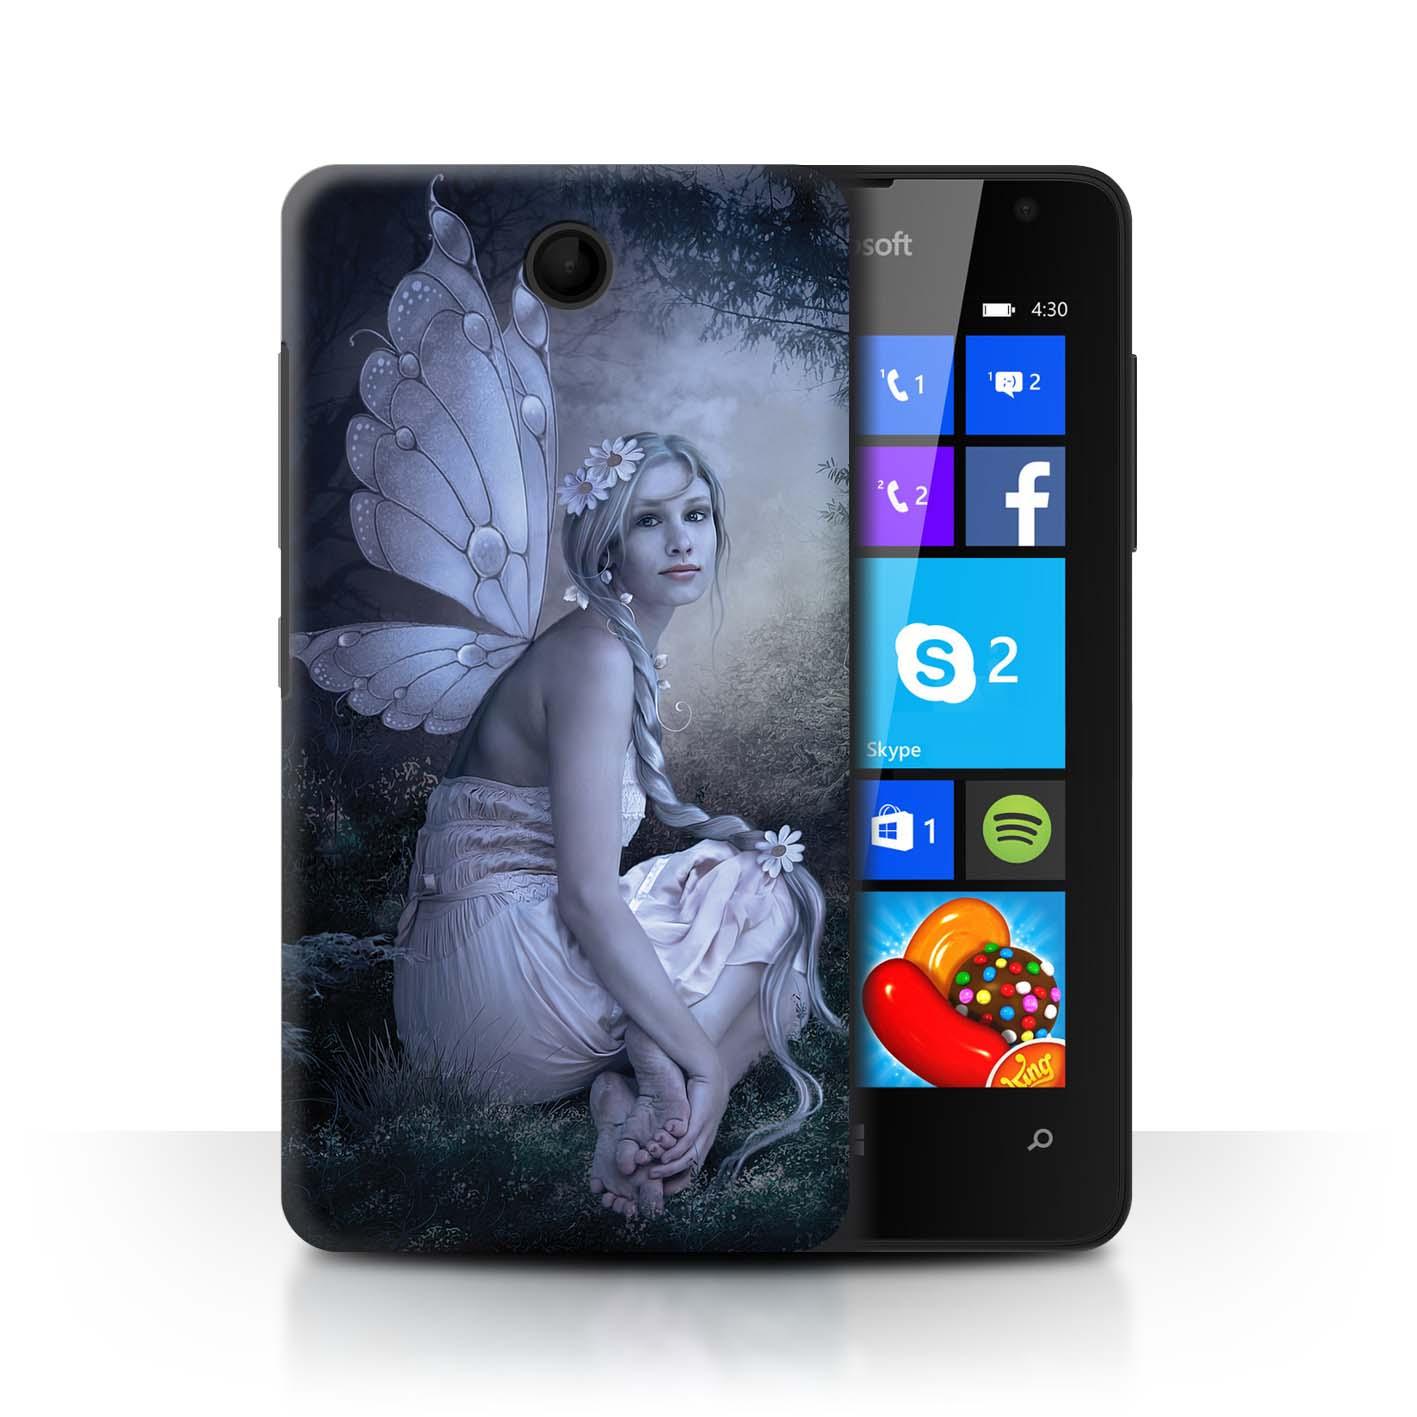 STUFF4-Coque-Etui-pour-Microsoft-Lumia-Smartphone-Fees-Elegantes-Housse